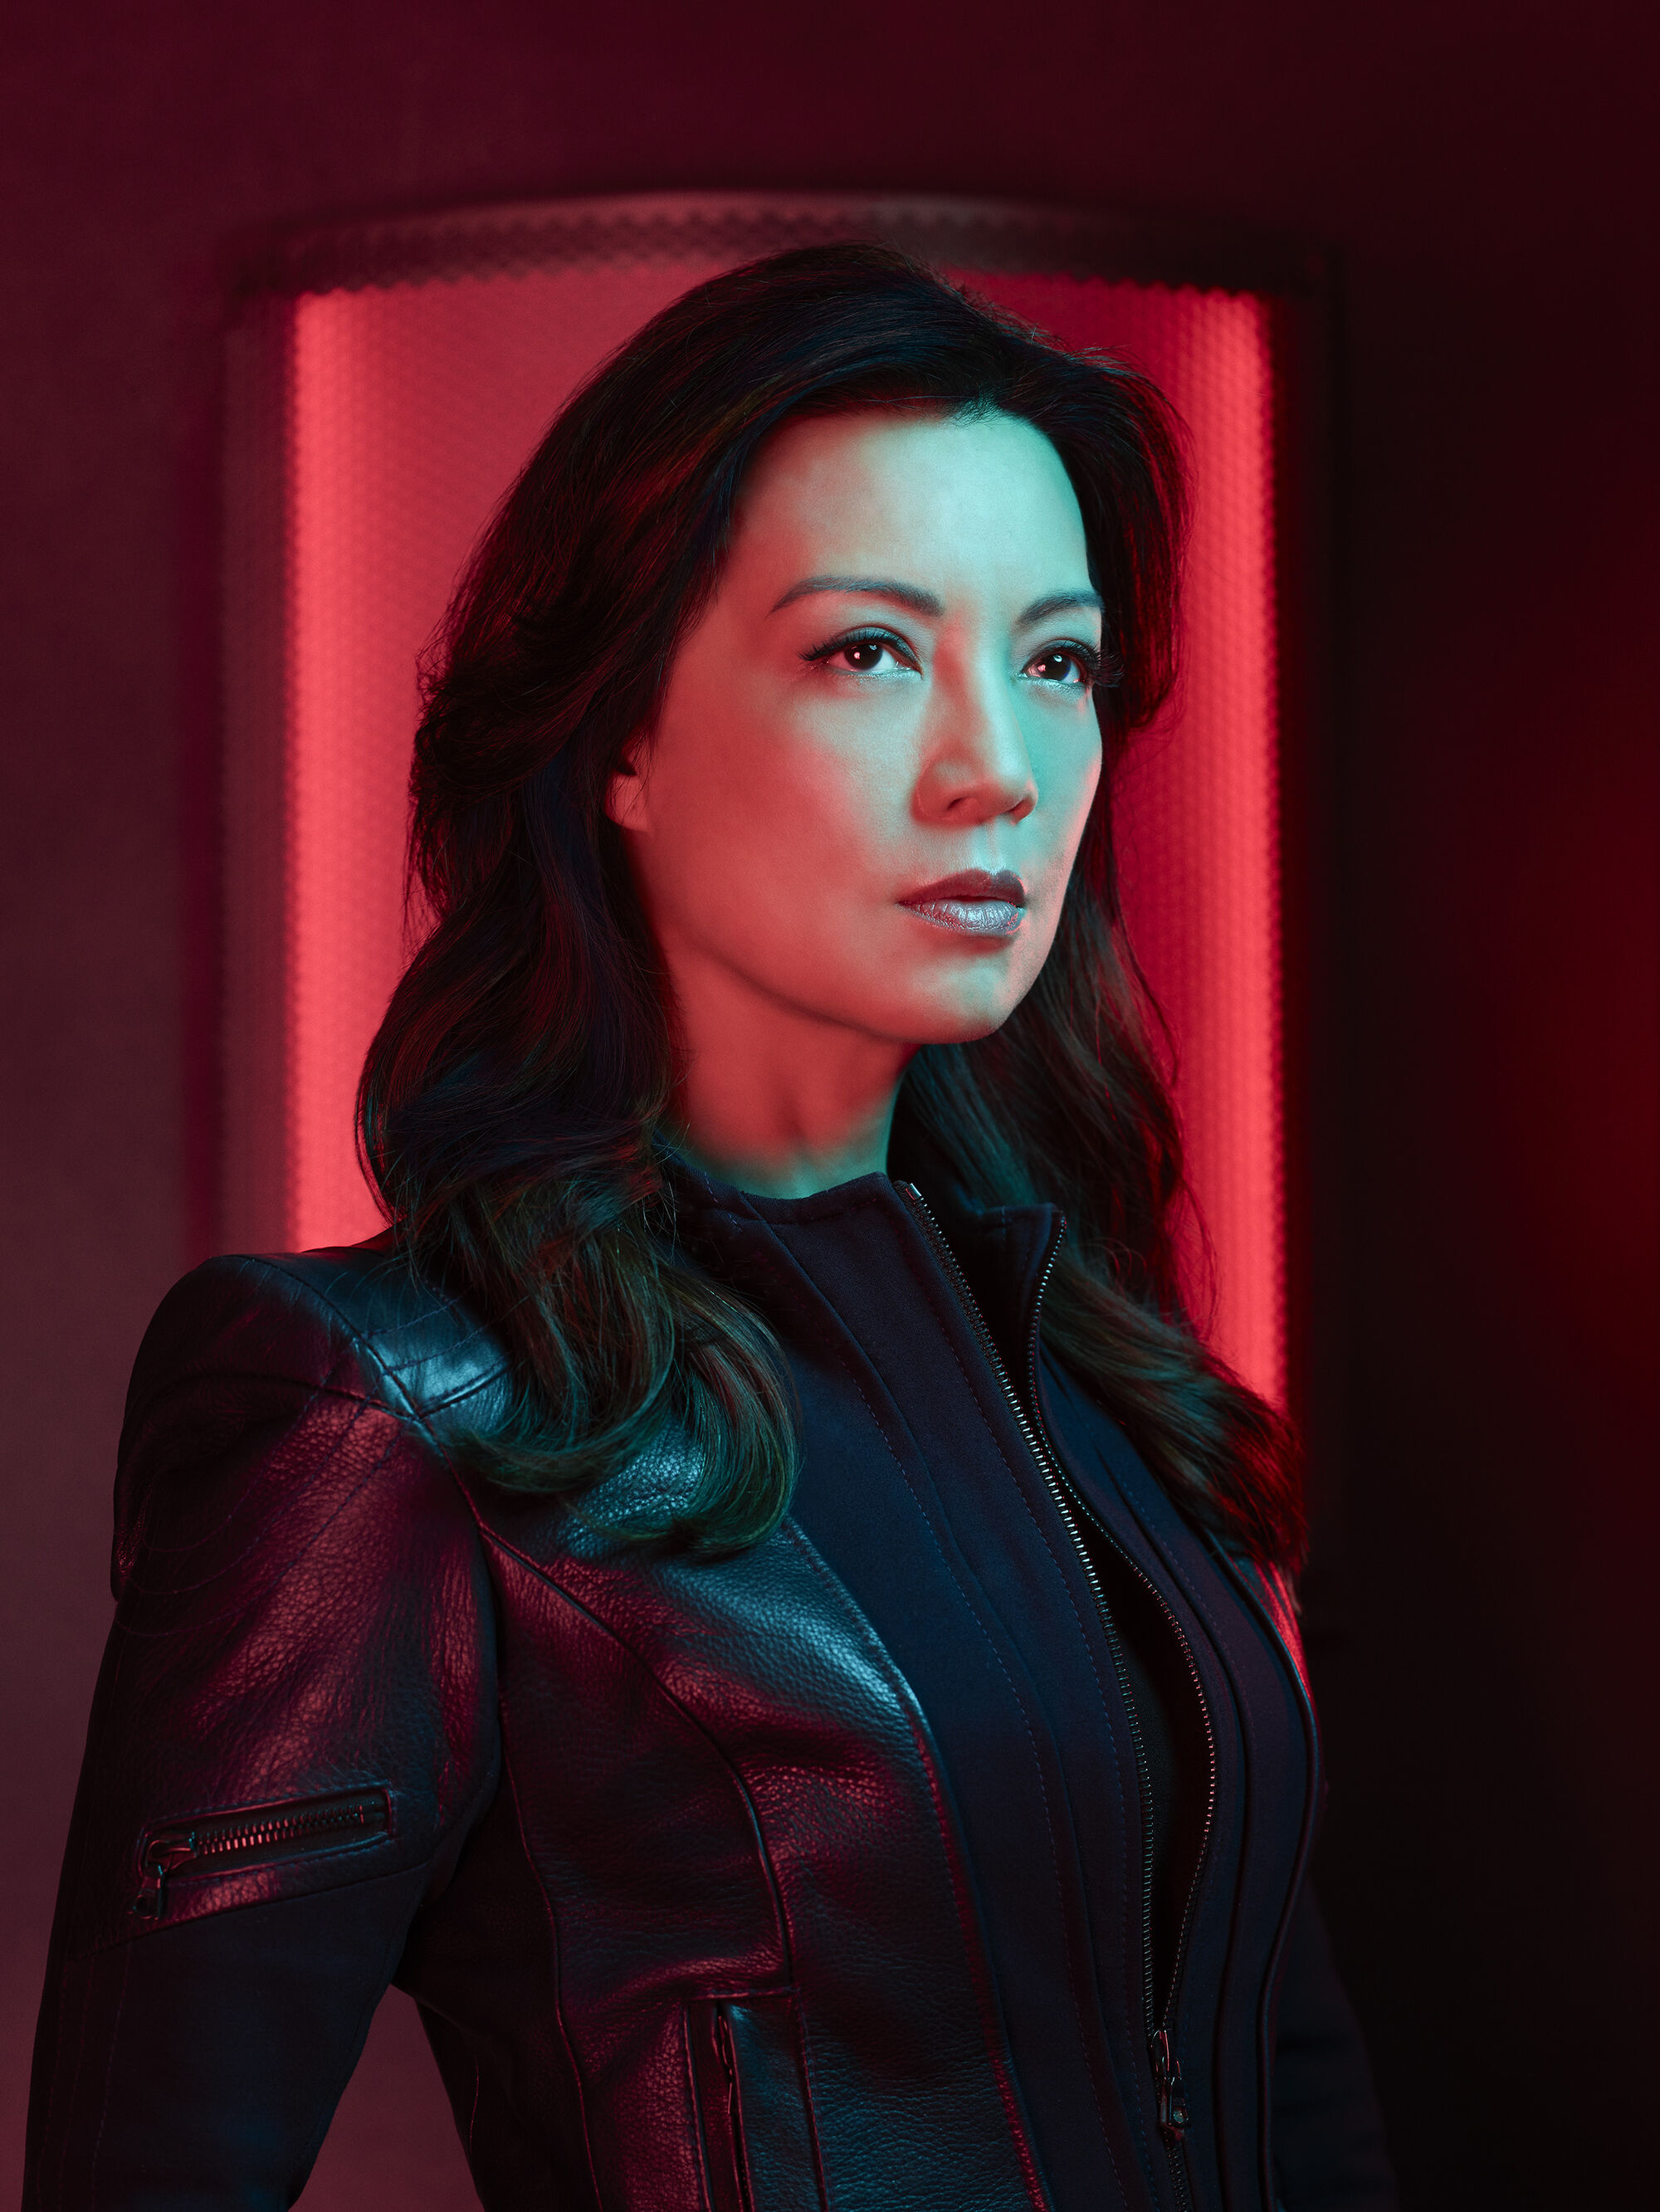 Melinda May | Marvel Cinematic Universe Wiki | FANDOM